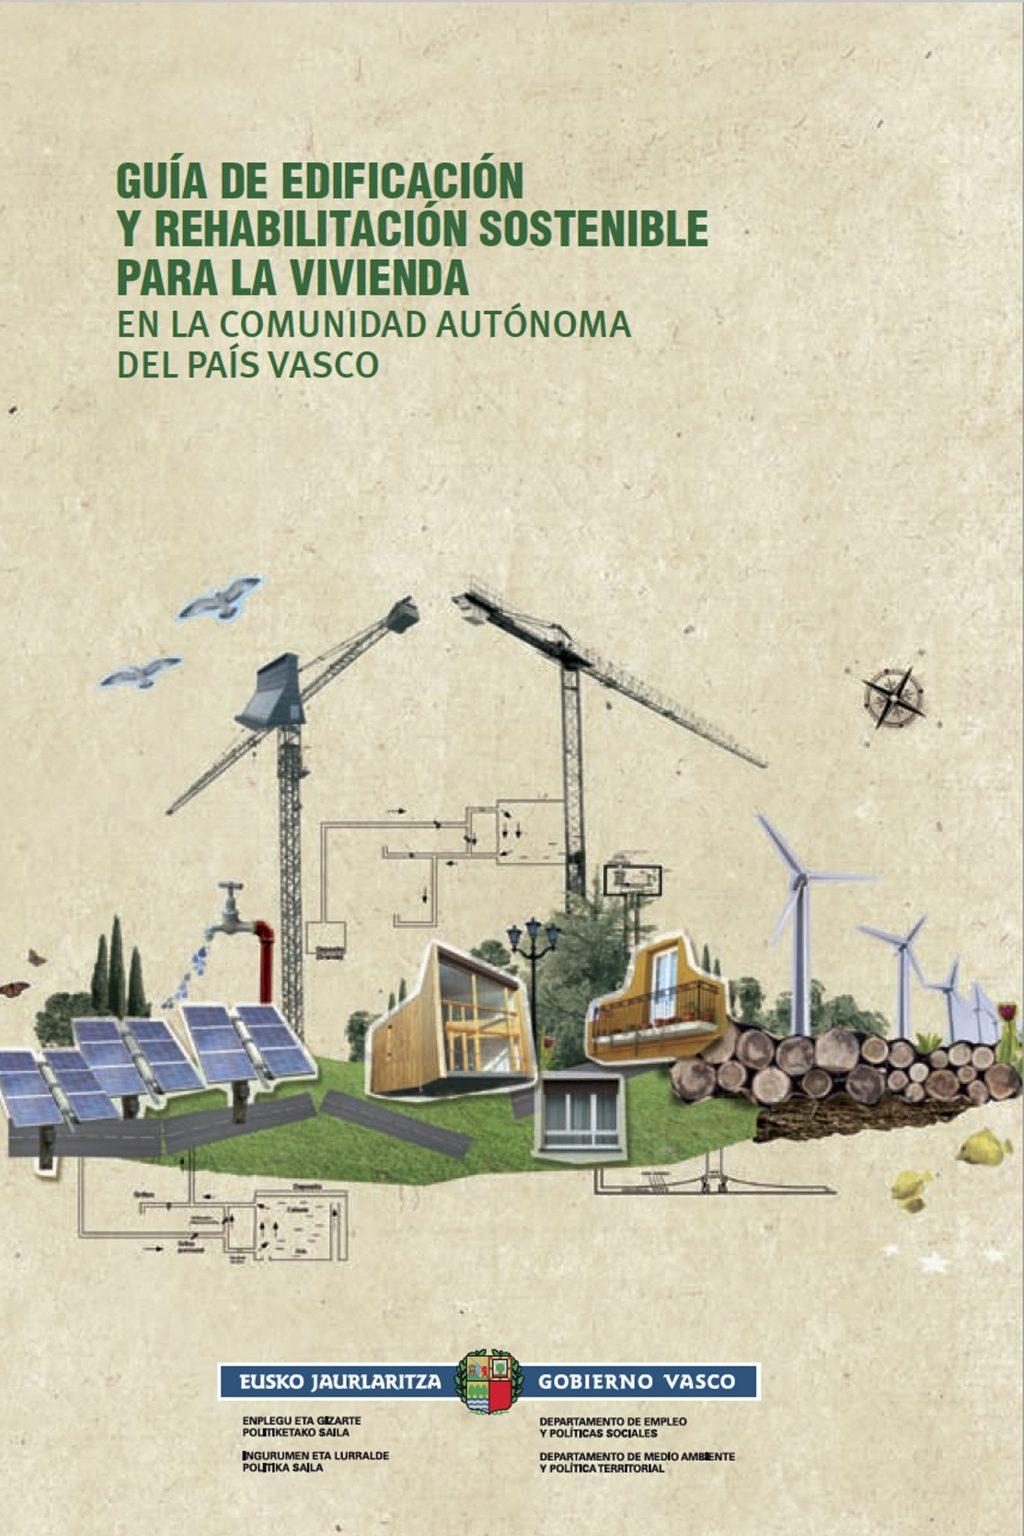 Guia-Edificacion-Sostenible-Pais-Vasco